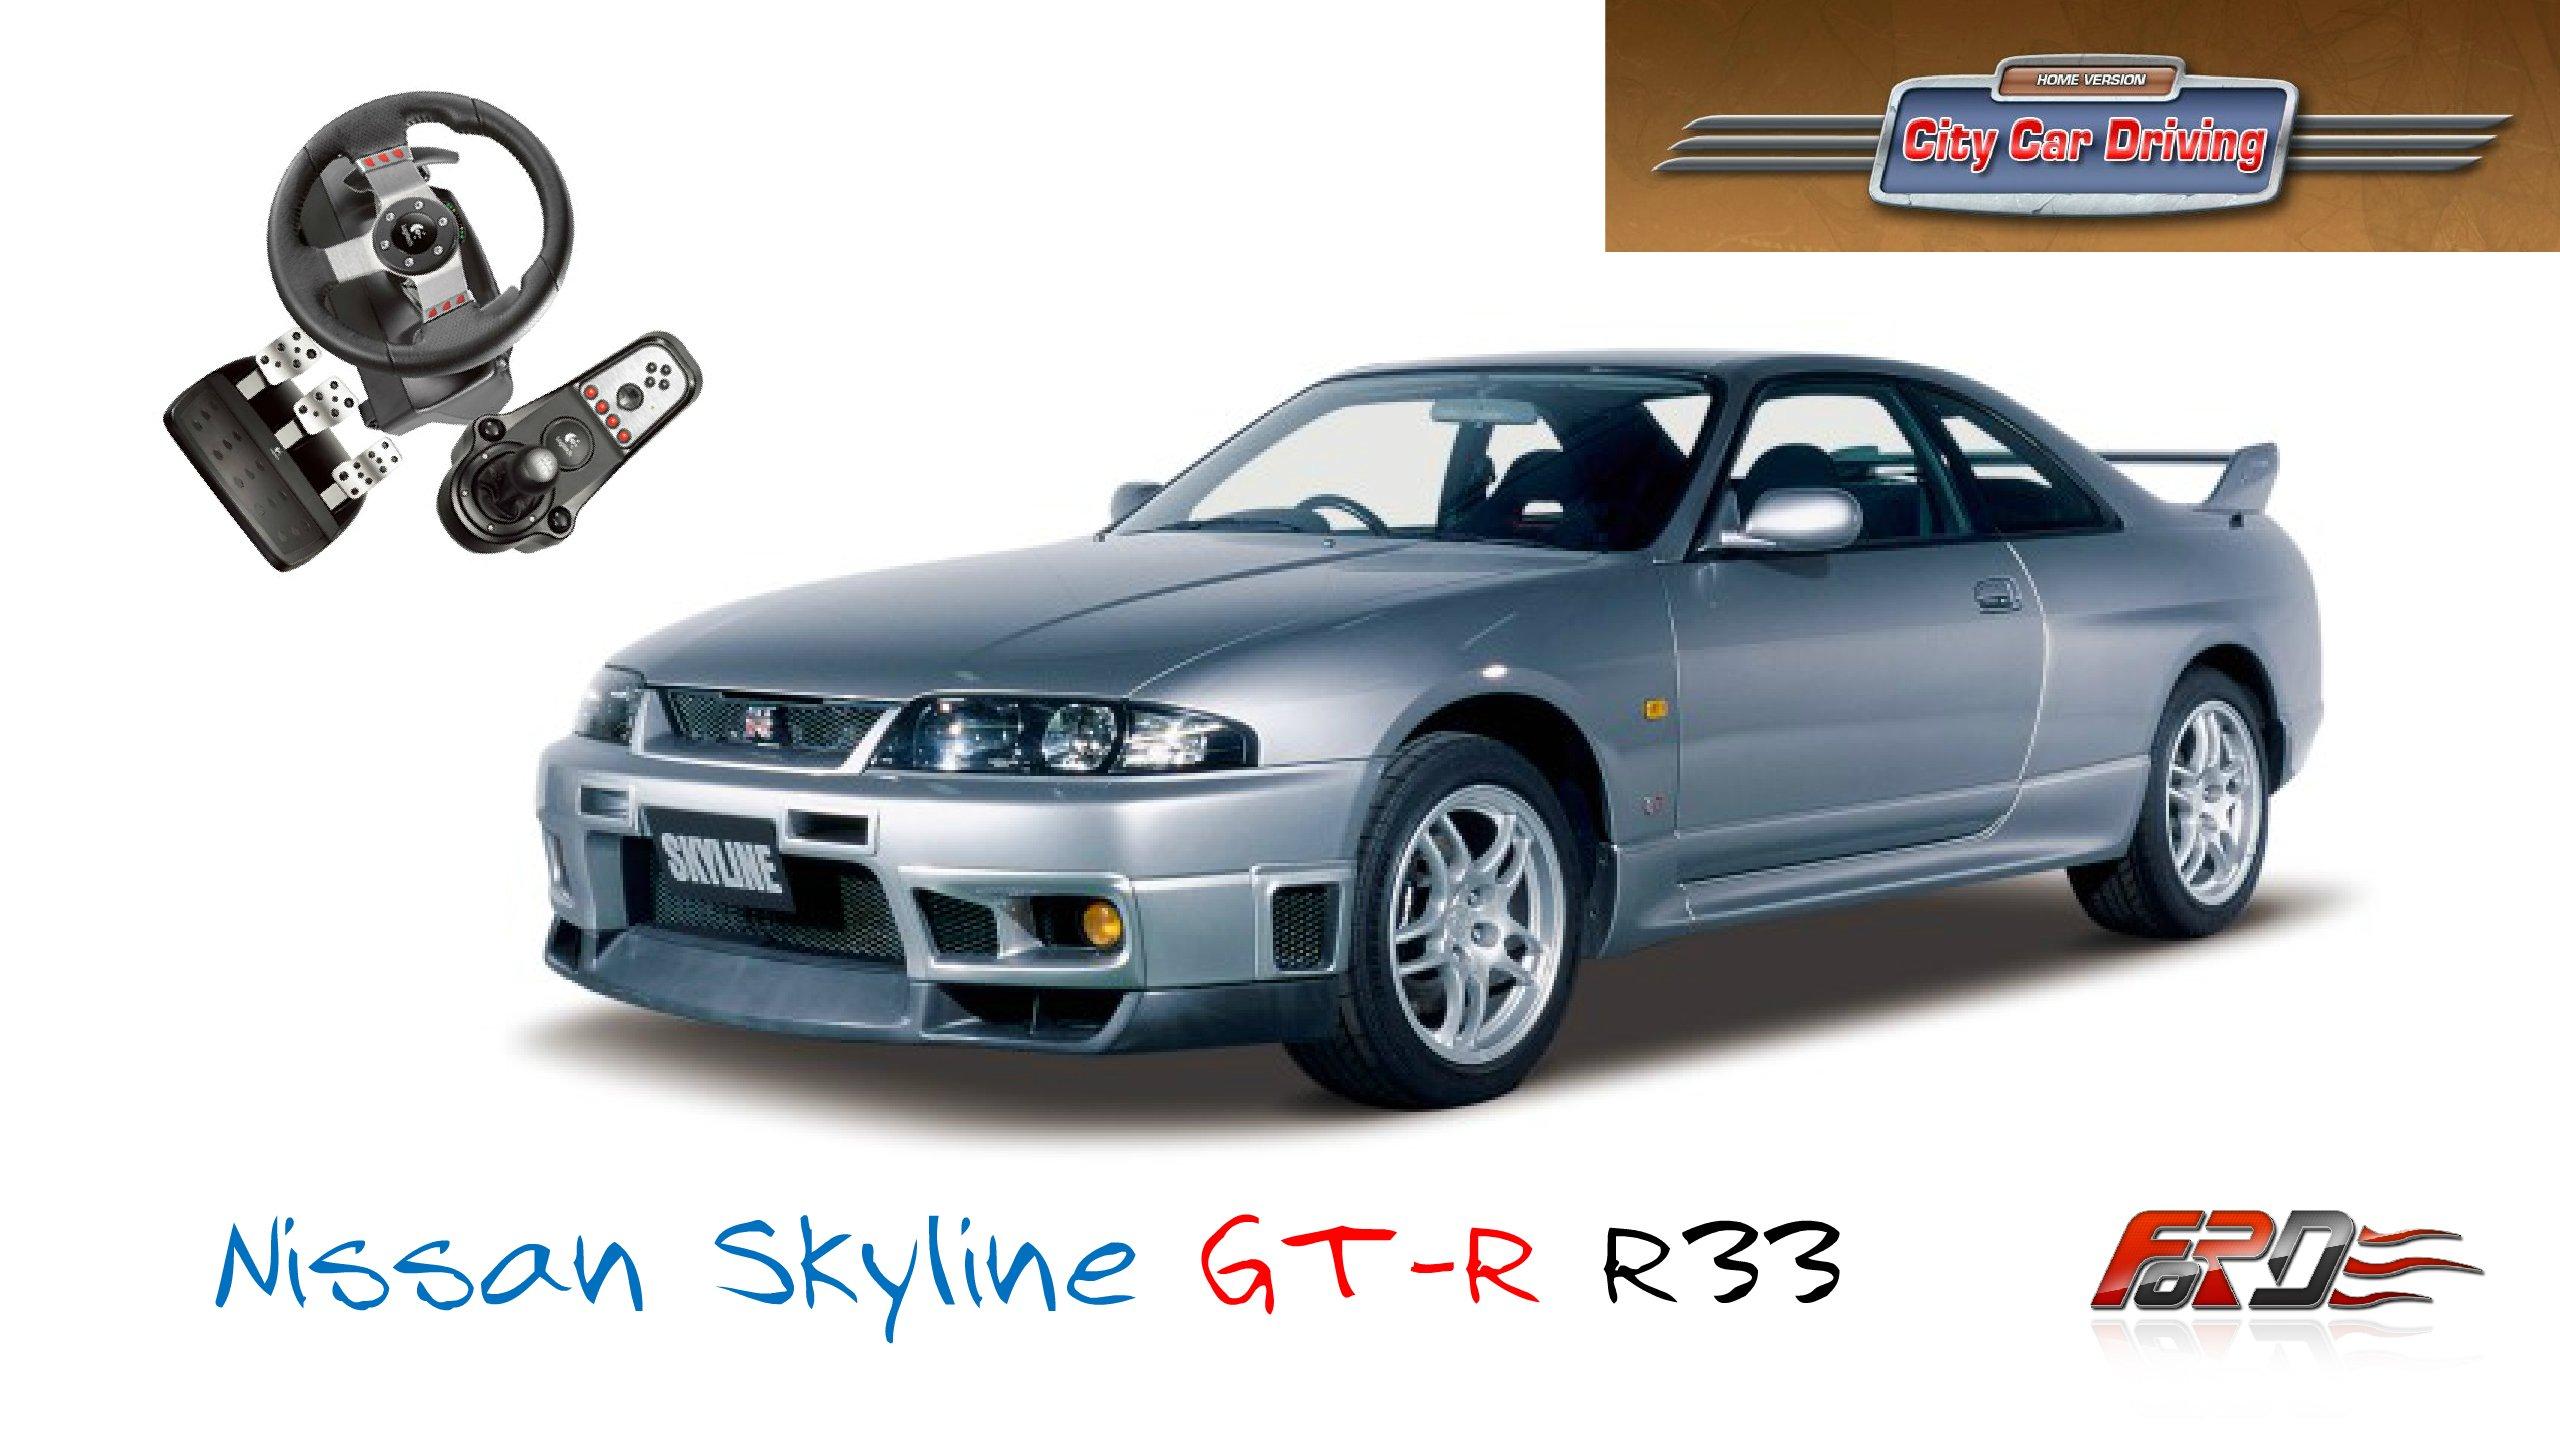 Nissan Skyline GTR R33 - тест-драйв, обзор, drift, японский корч City Car Driving  - Изображение 1